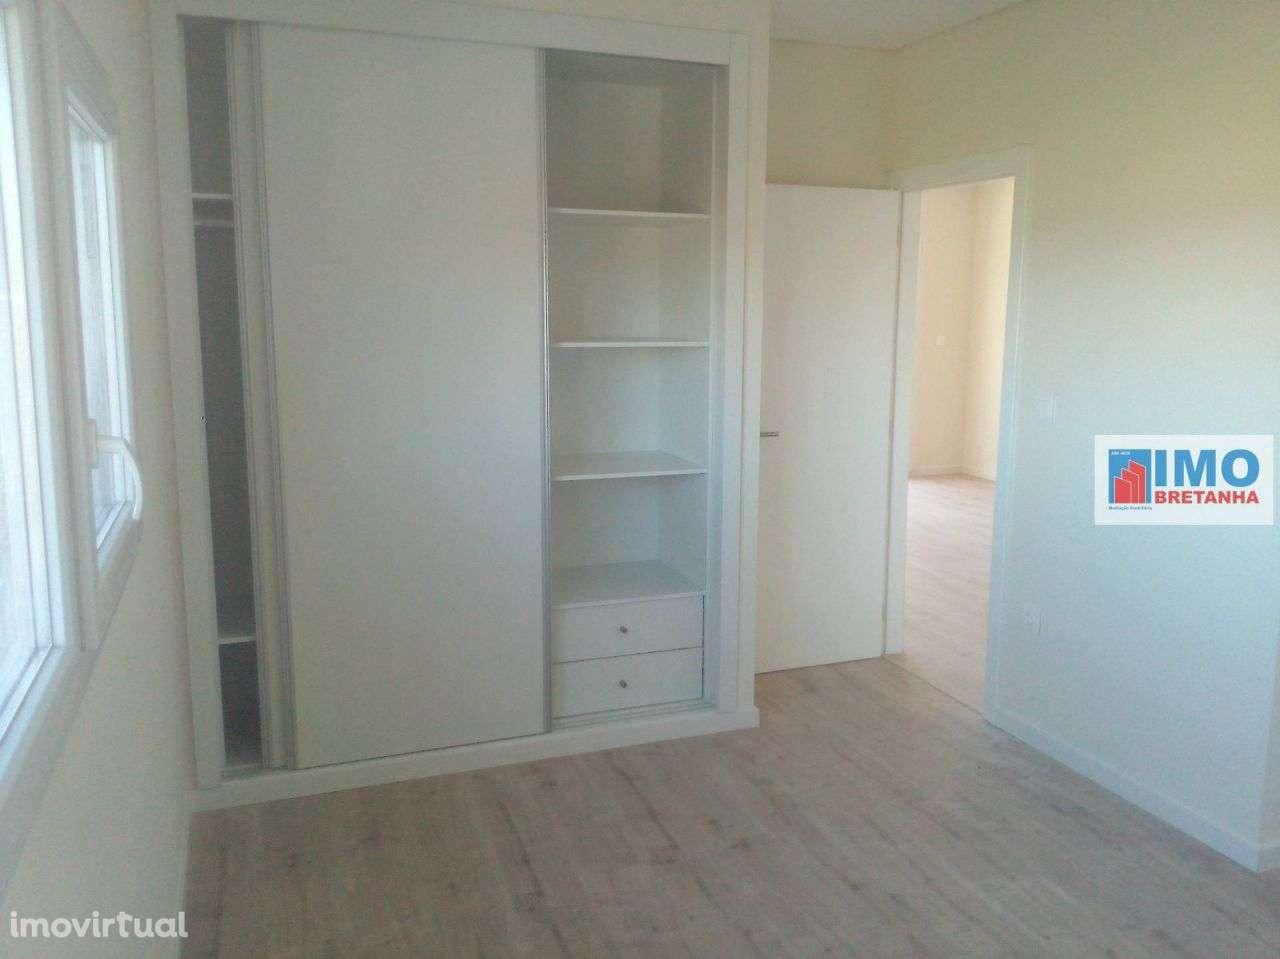 Apartamento para comprar, Covilhã e Canhoso, Covilhã, Castelo Branco - Foto 11